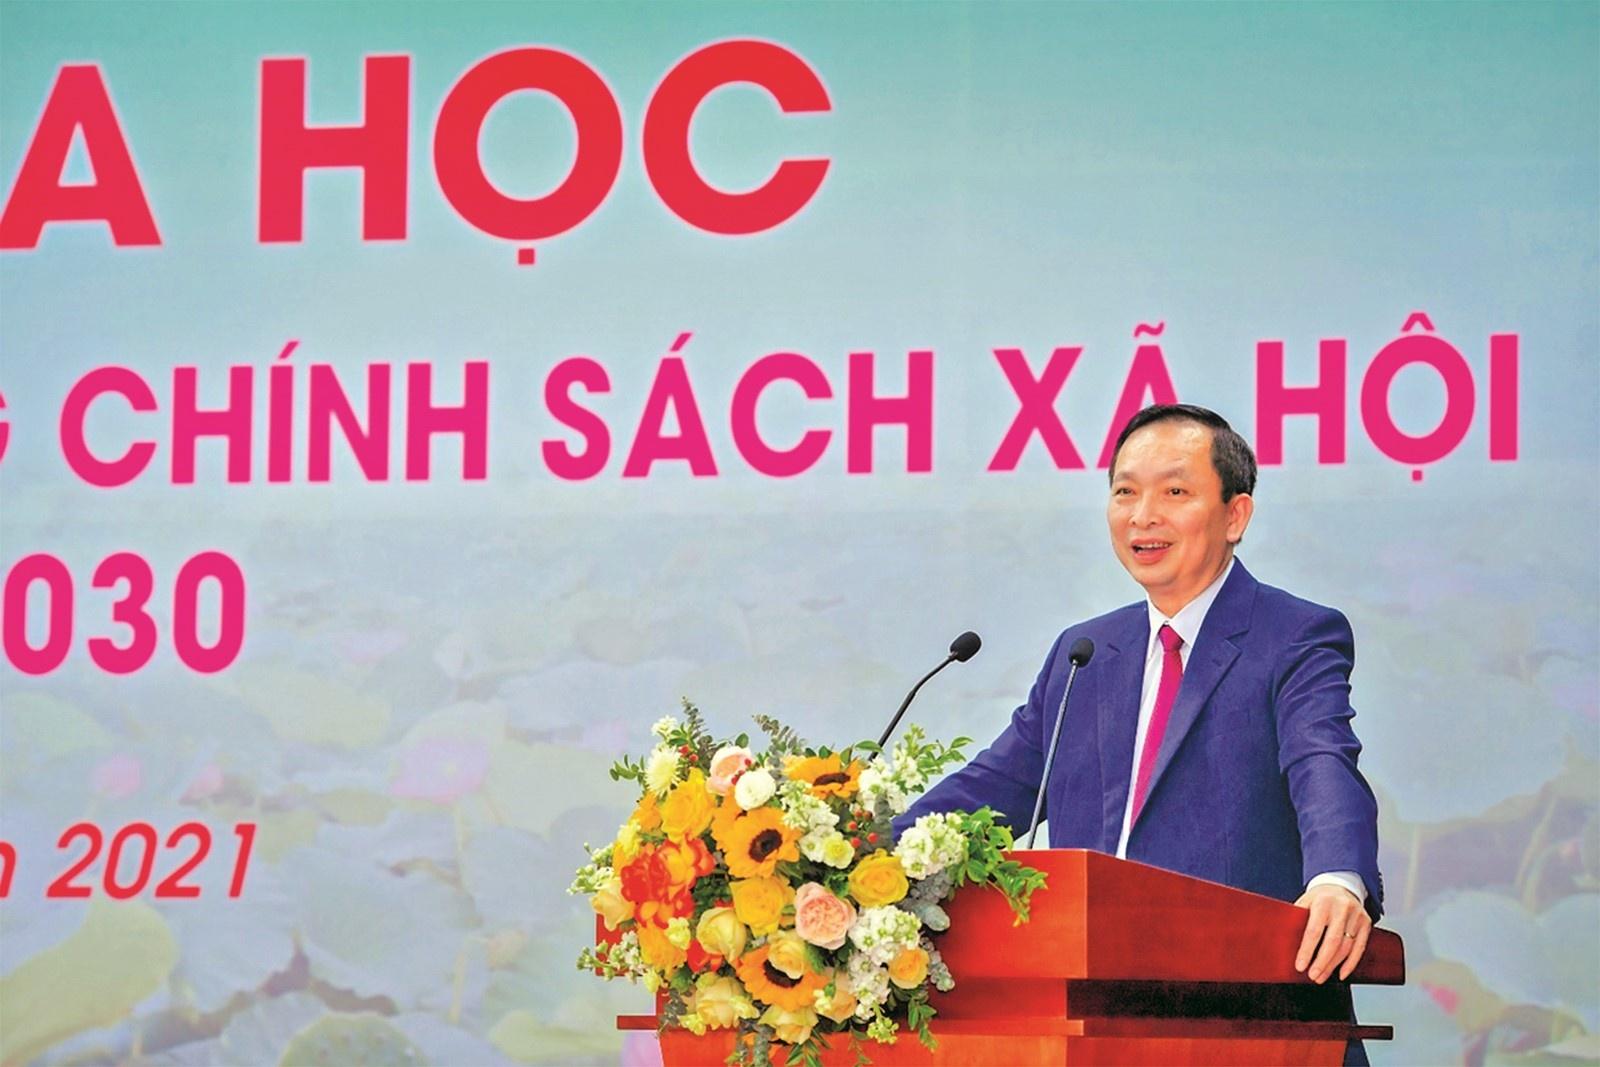 phat trien ngan hang chinh sach xa hoi can dat trong chien luoc tai chinh toan dien